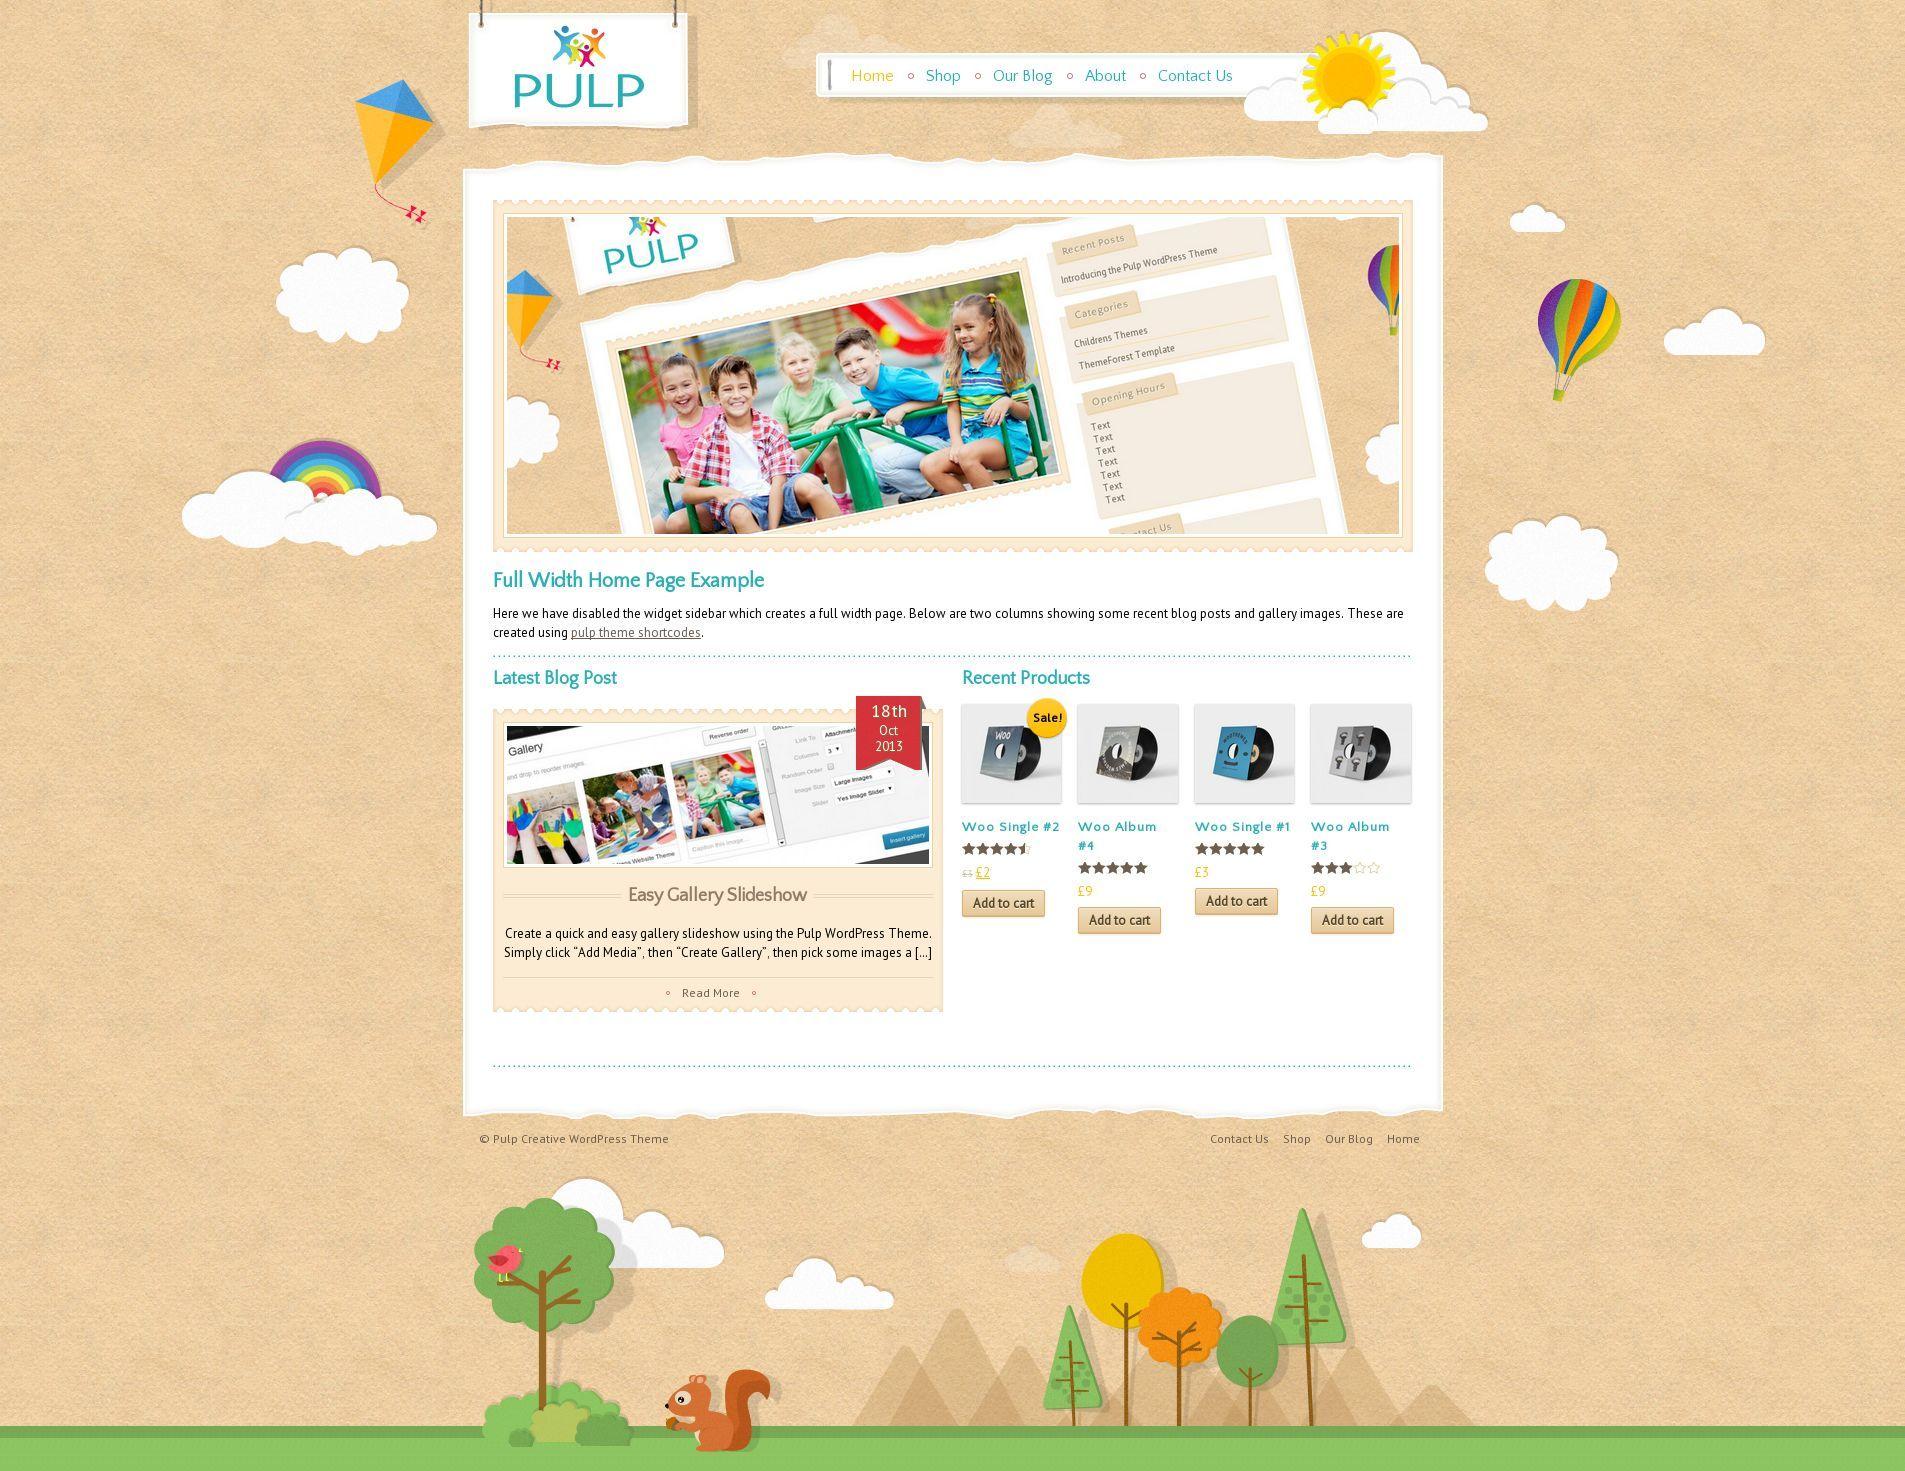 screenshots1creative kids responsive wordpress theme with animationjpg screenshots2pulp creative_home page blog screenshotjpg